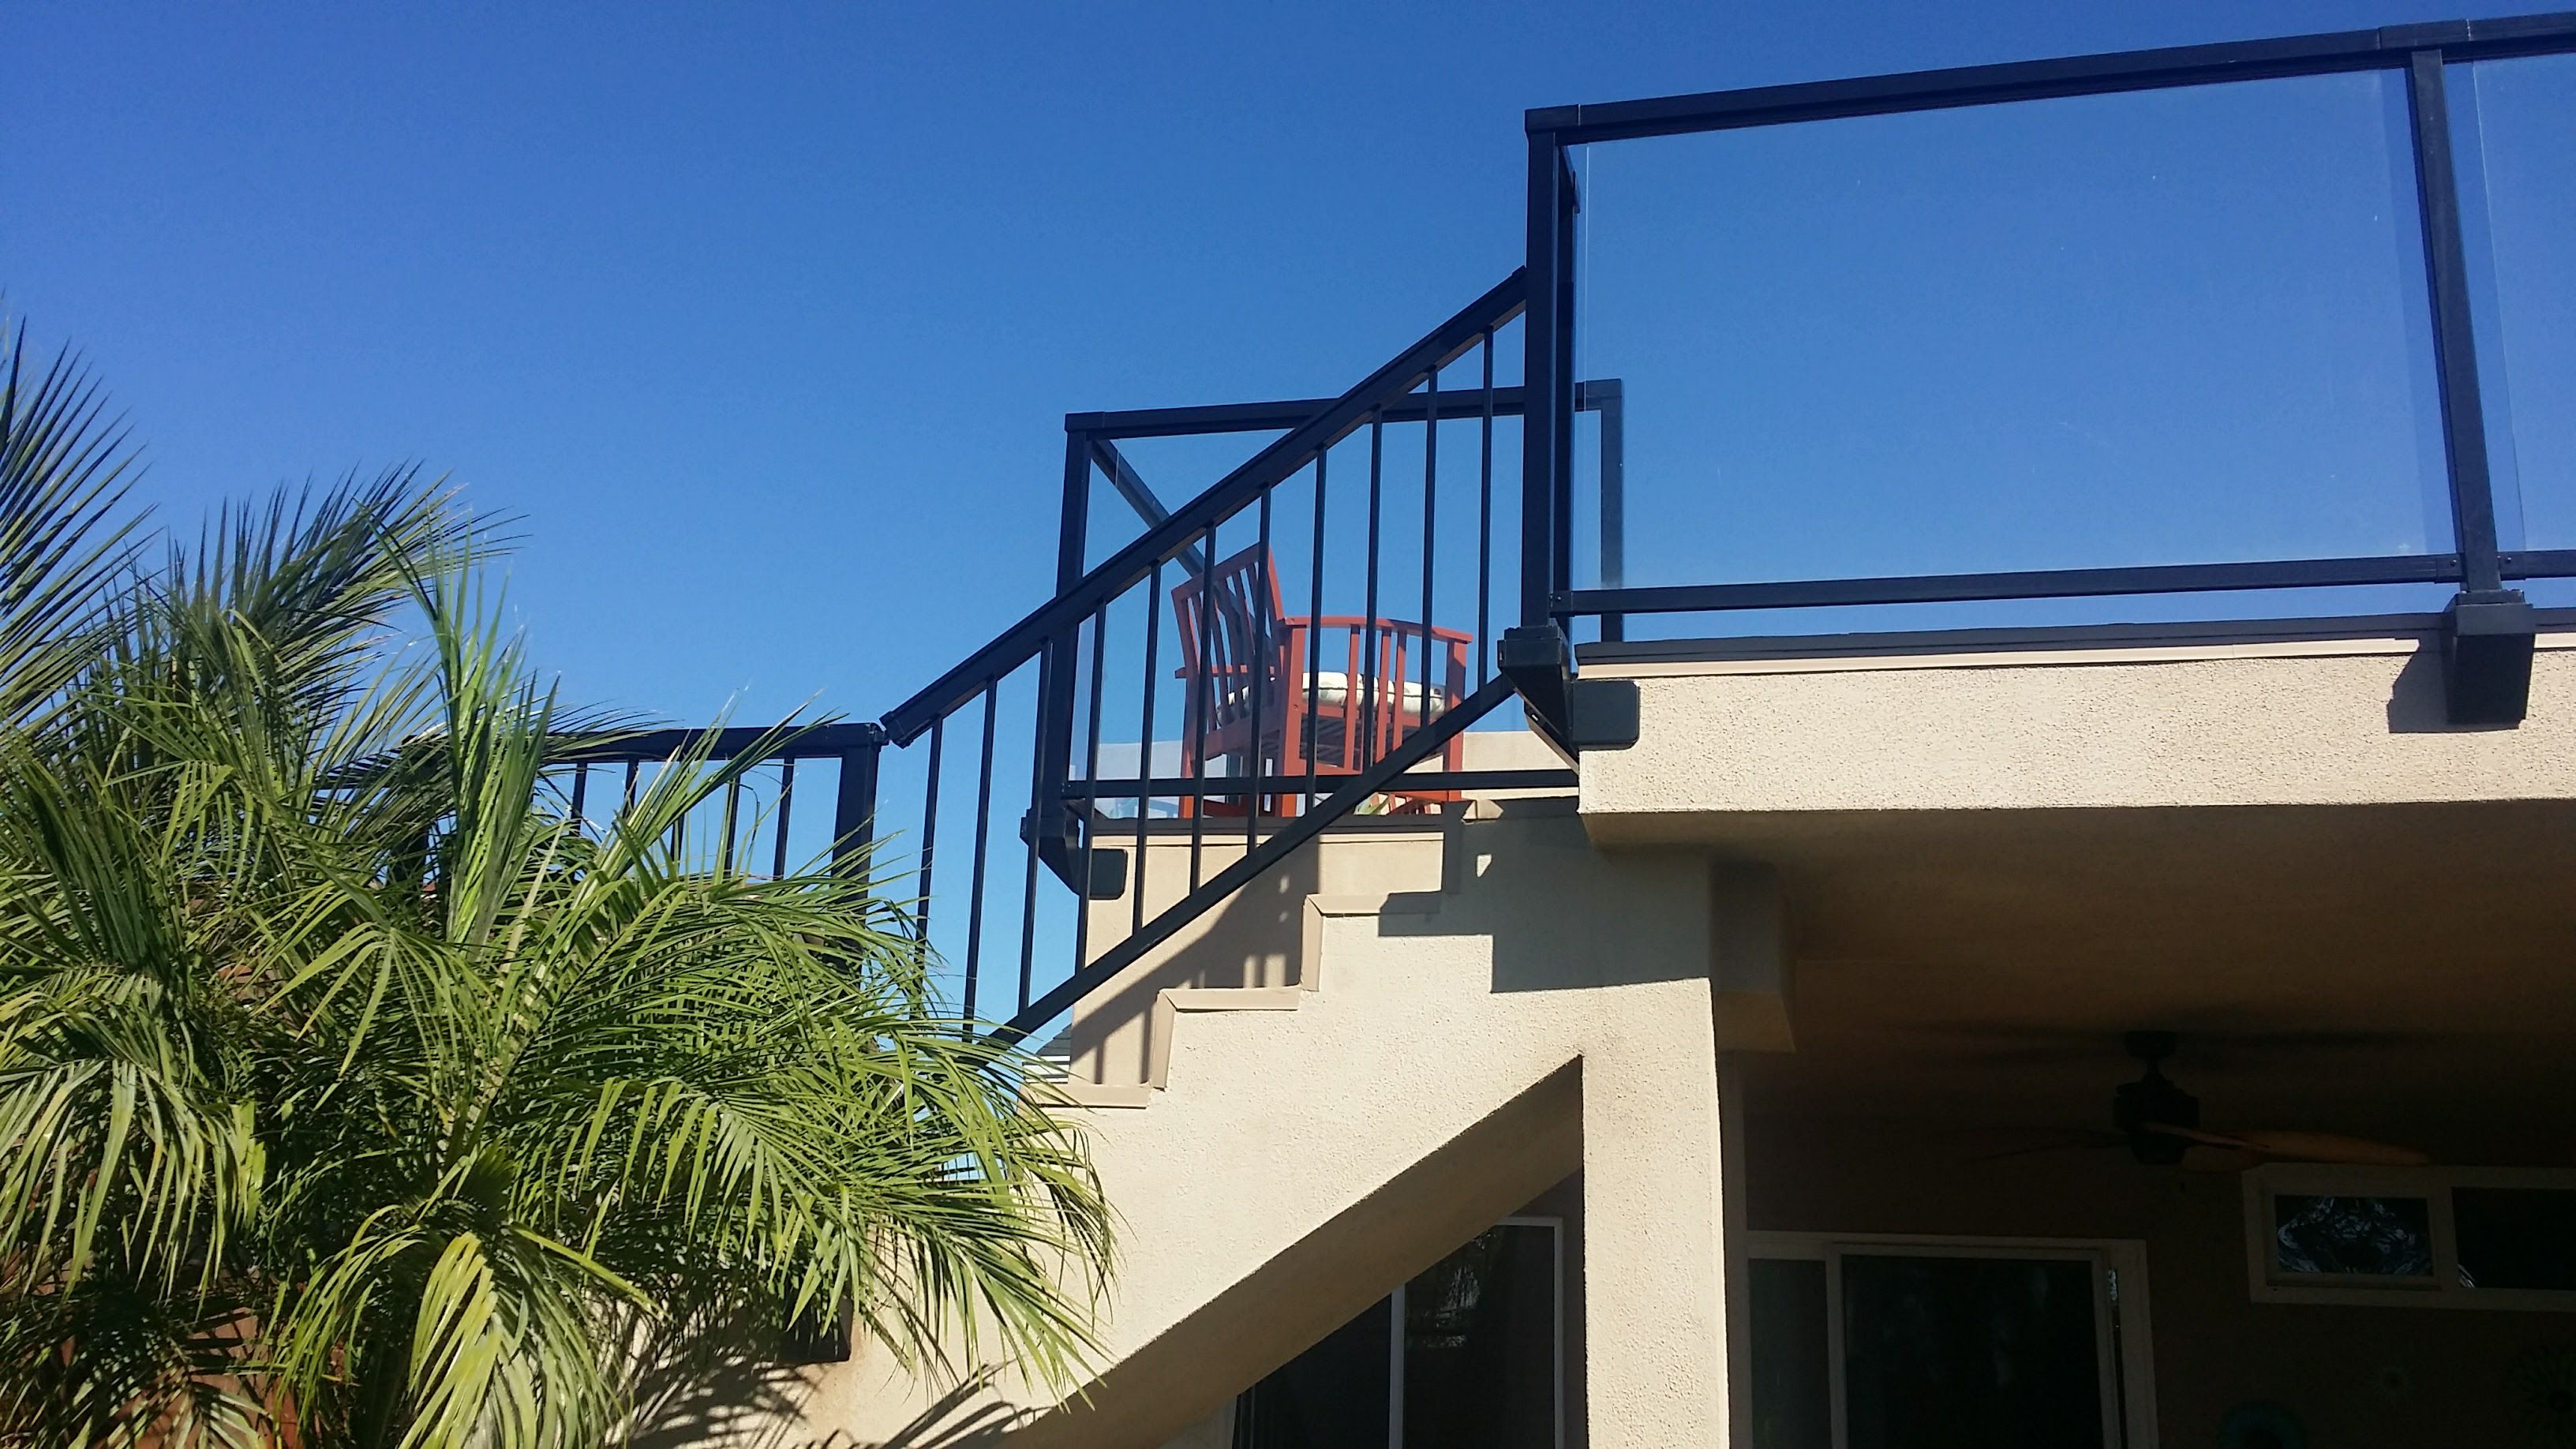 Peak Facia Deck Railing Glass   Deck railings, Home depot ...